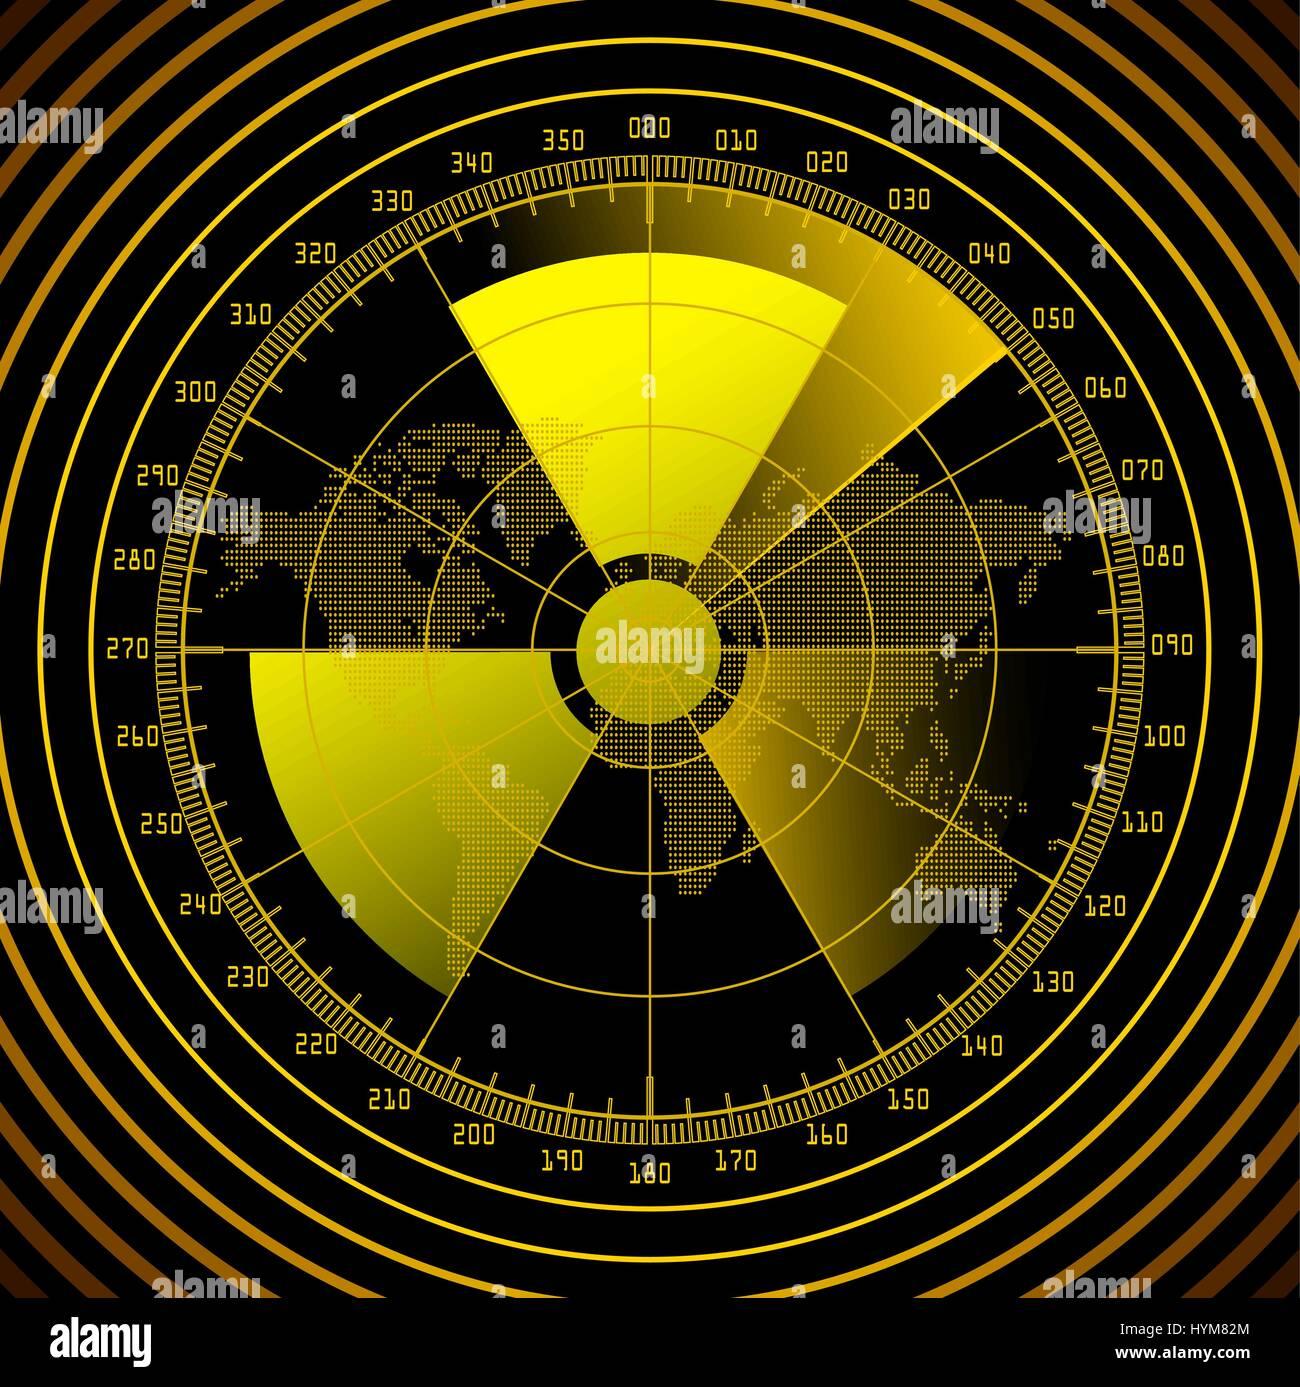 Radar screen with radioactive sign - Stock Vector